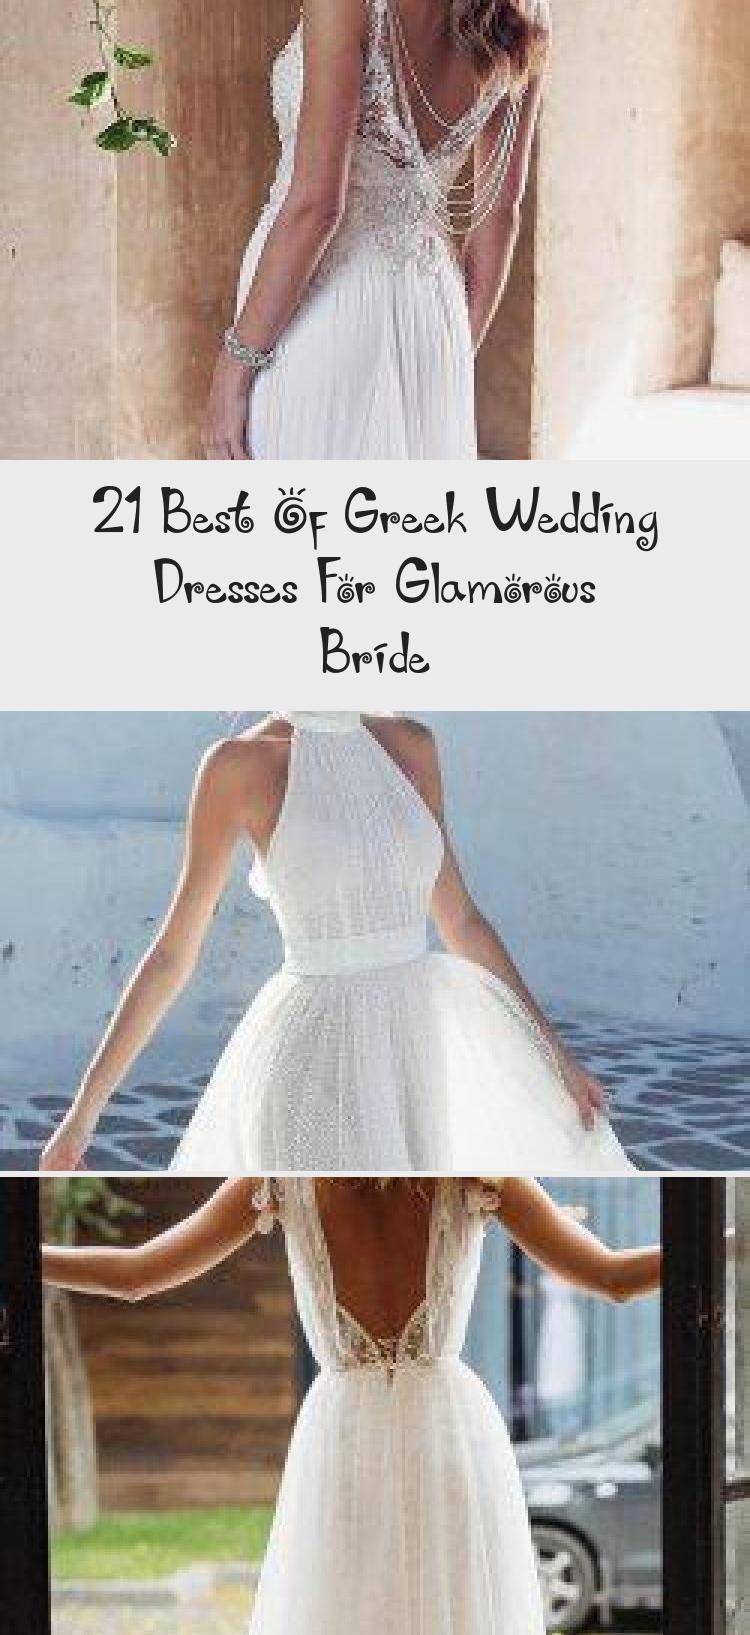 21 Best Of Greek Wedding Dresses For Glamorous Bride - Clothing & Dress #greekweddingdresses 21 Best Of Greek Wedding Dresses For Glamorous Bride | Wedding Forward #weddingdressesguestYellow #Italianweddingdressesguest #weddingdressesguestGold #weddingdressesguest2018 #weddingdressesguestWinter #greekweddingdresses